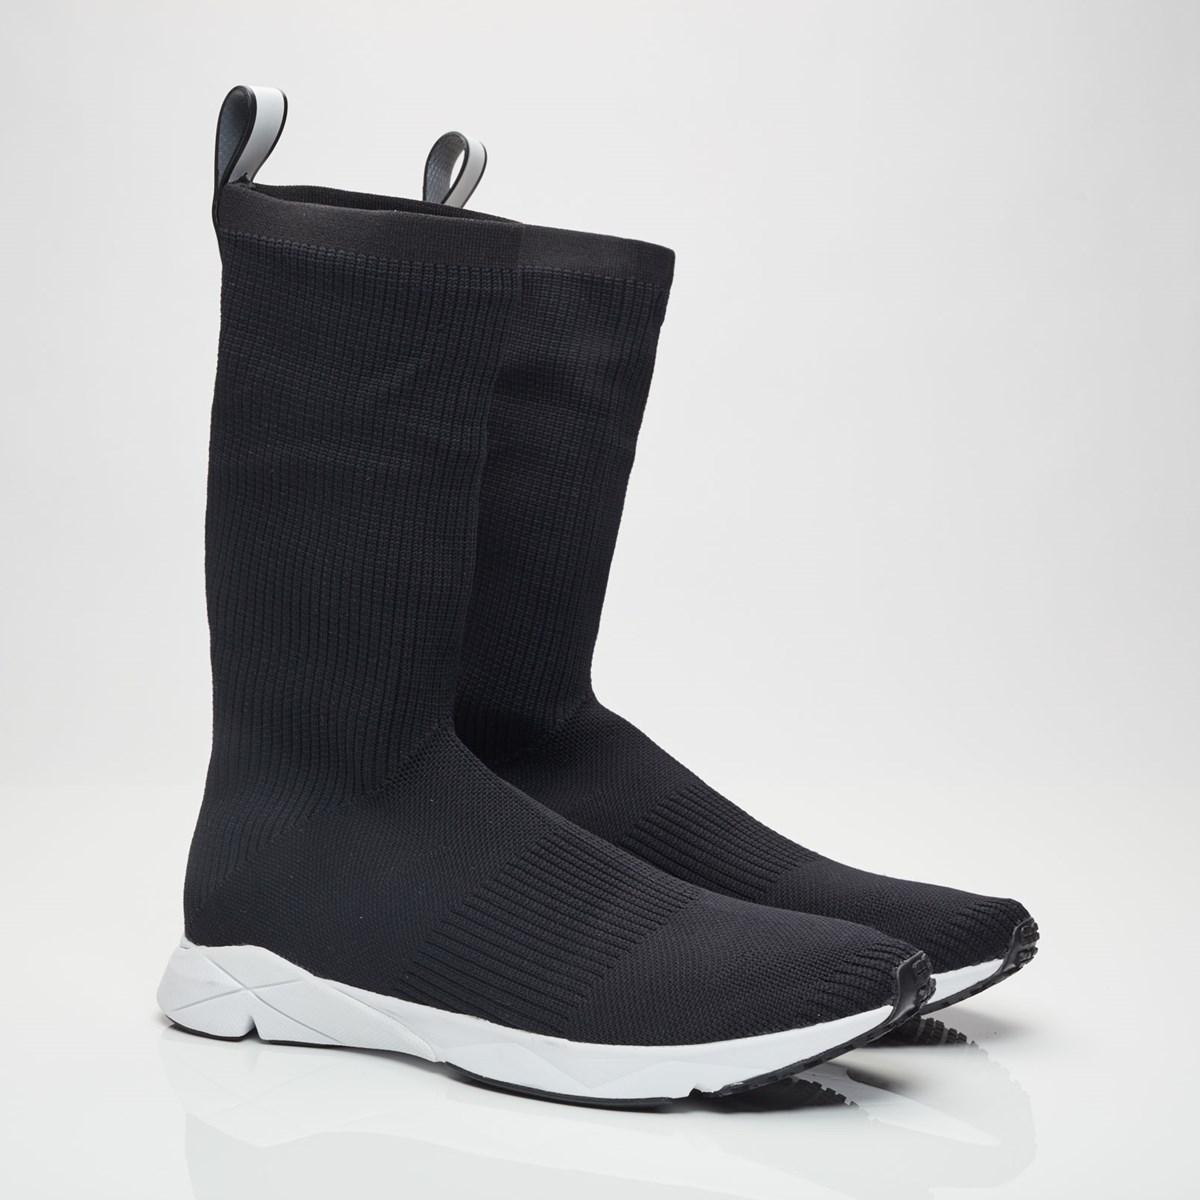 8271270cb235 Reebok Sock Supreme ULTK - Bs9515 - Sneakersnstuff